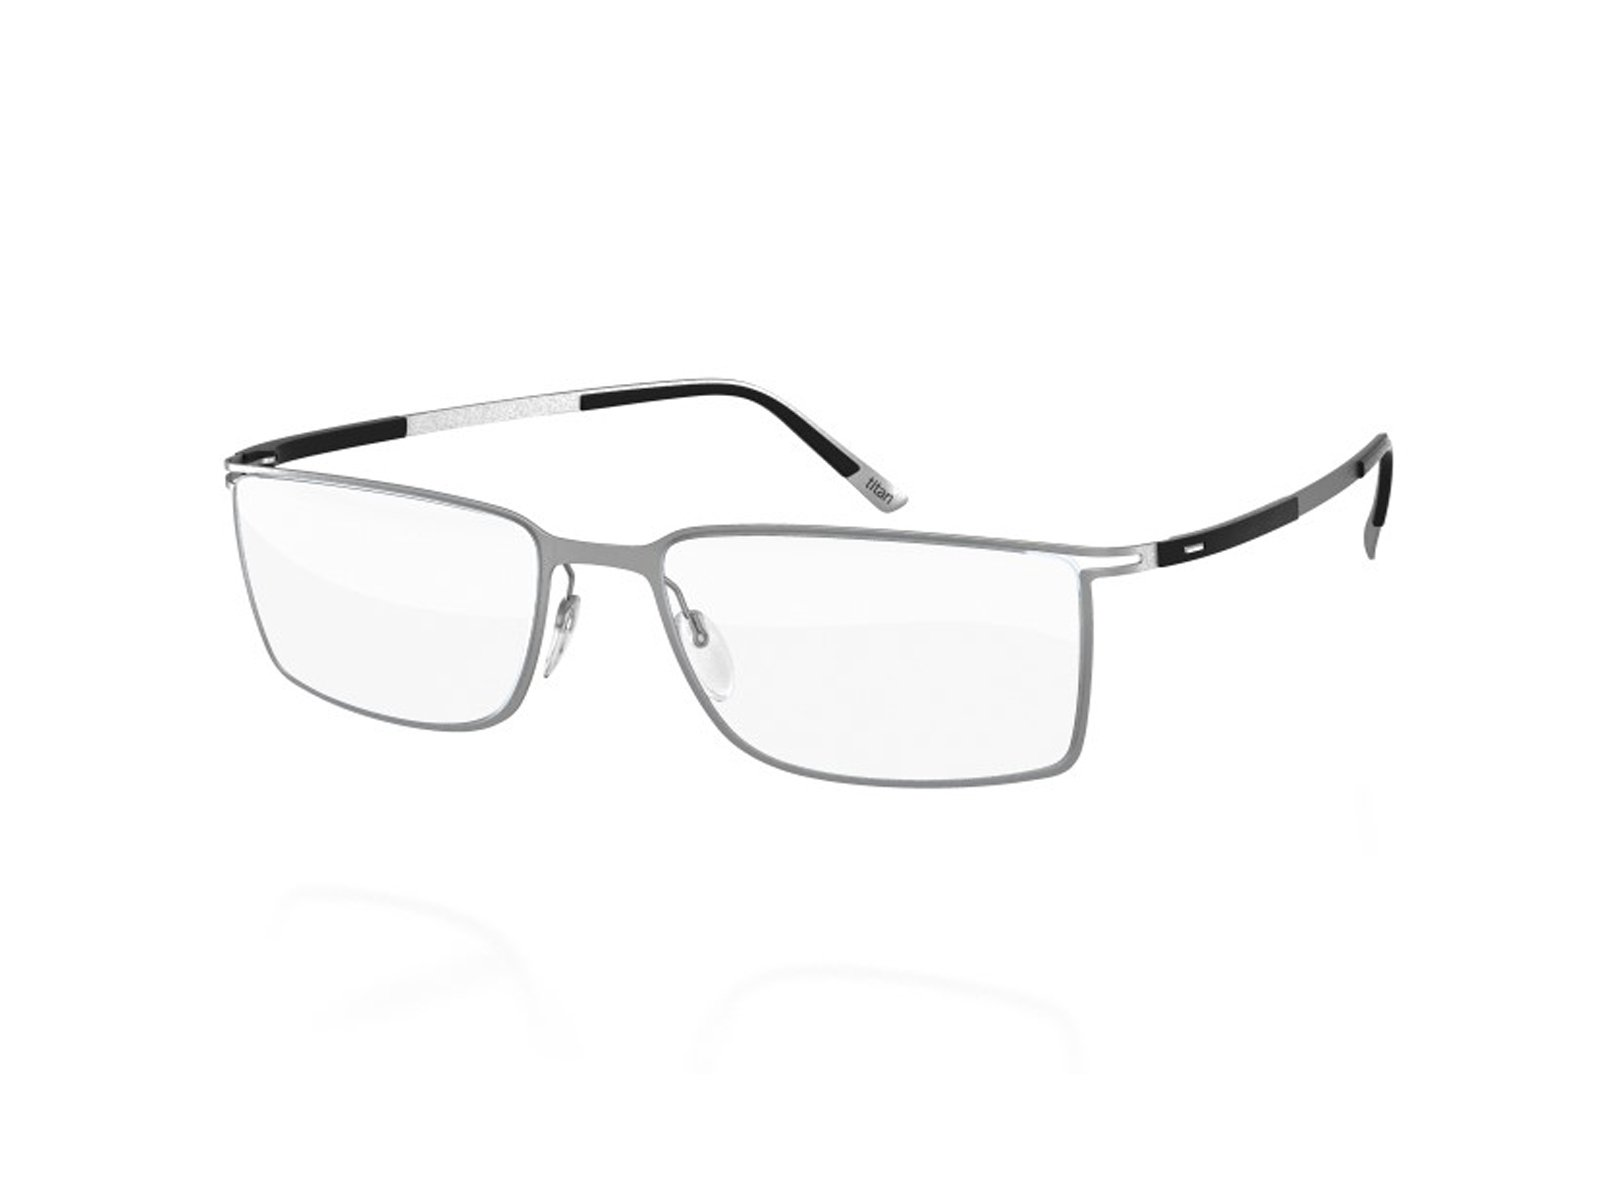 Silhouette Eyeglasses Titan Contour Fullrim 5445 (SILVER BLACK, 54MM)